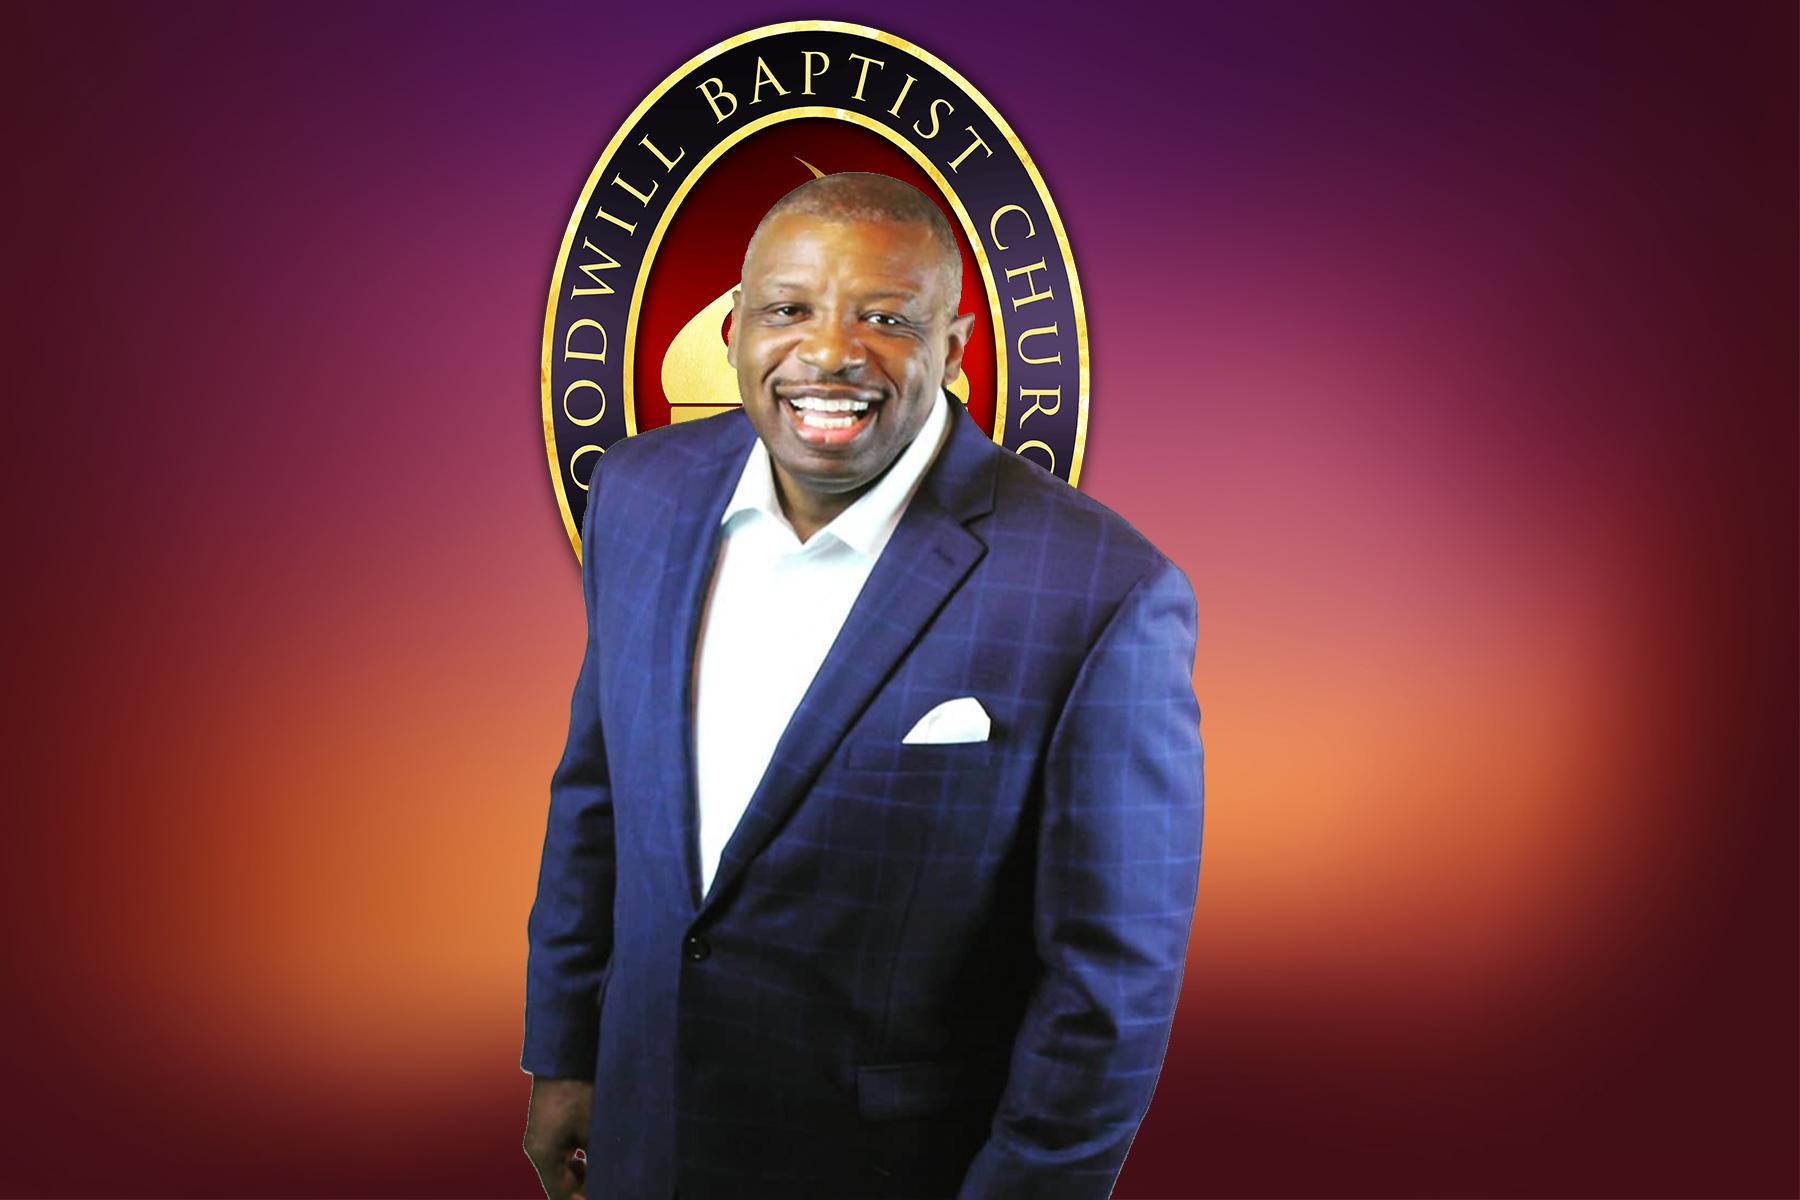 Bishop Stephen Williams - Senior Pastor & Public Relations